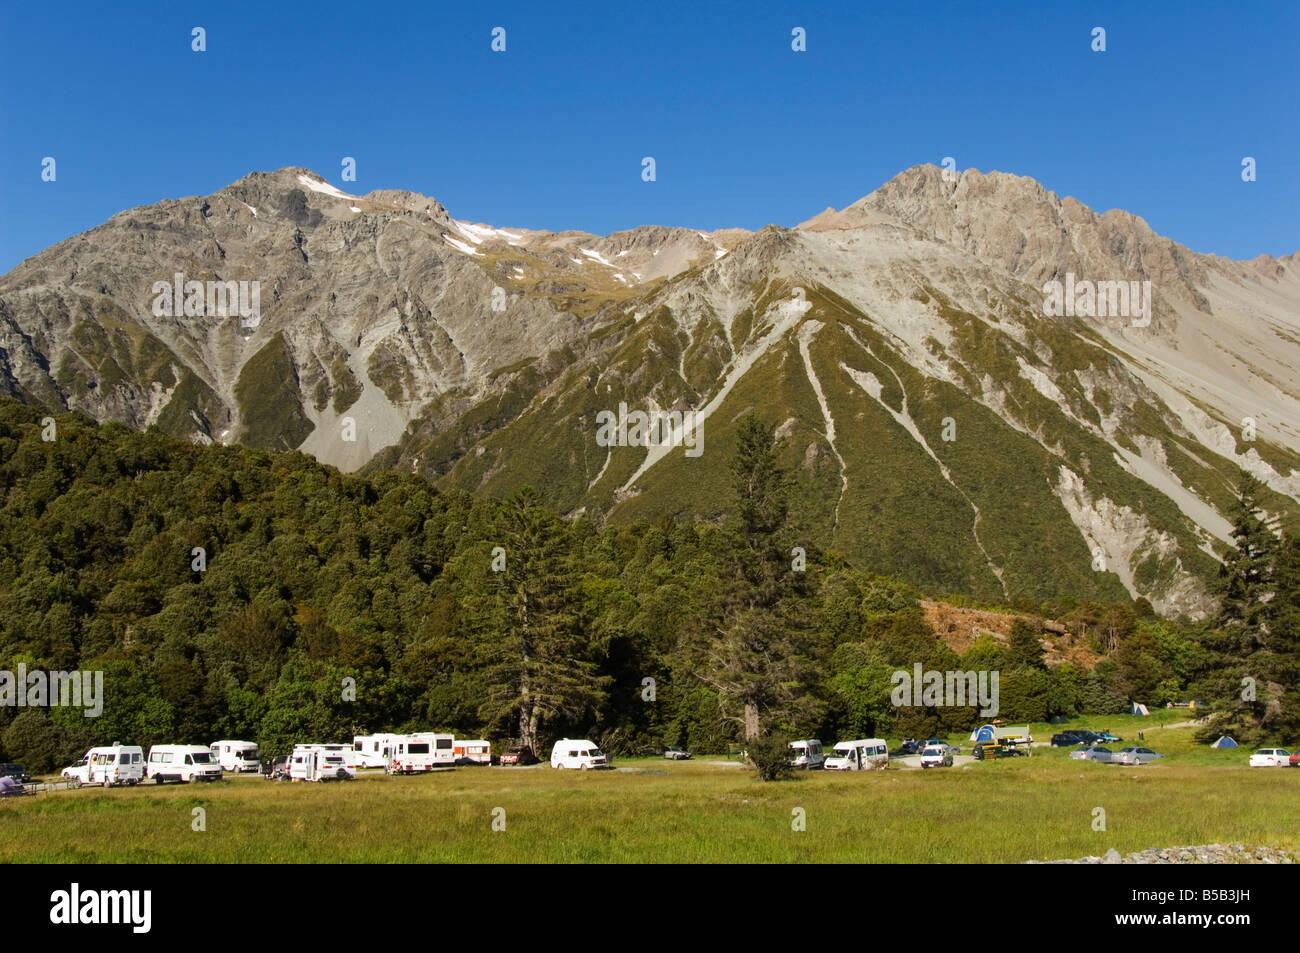 A designated campsite in Aoraki National Park, part of Te Wahipounamu, Mackenzie Country, South Island, New Zealand - Stock Image